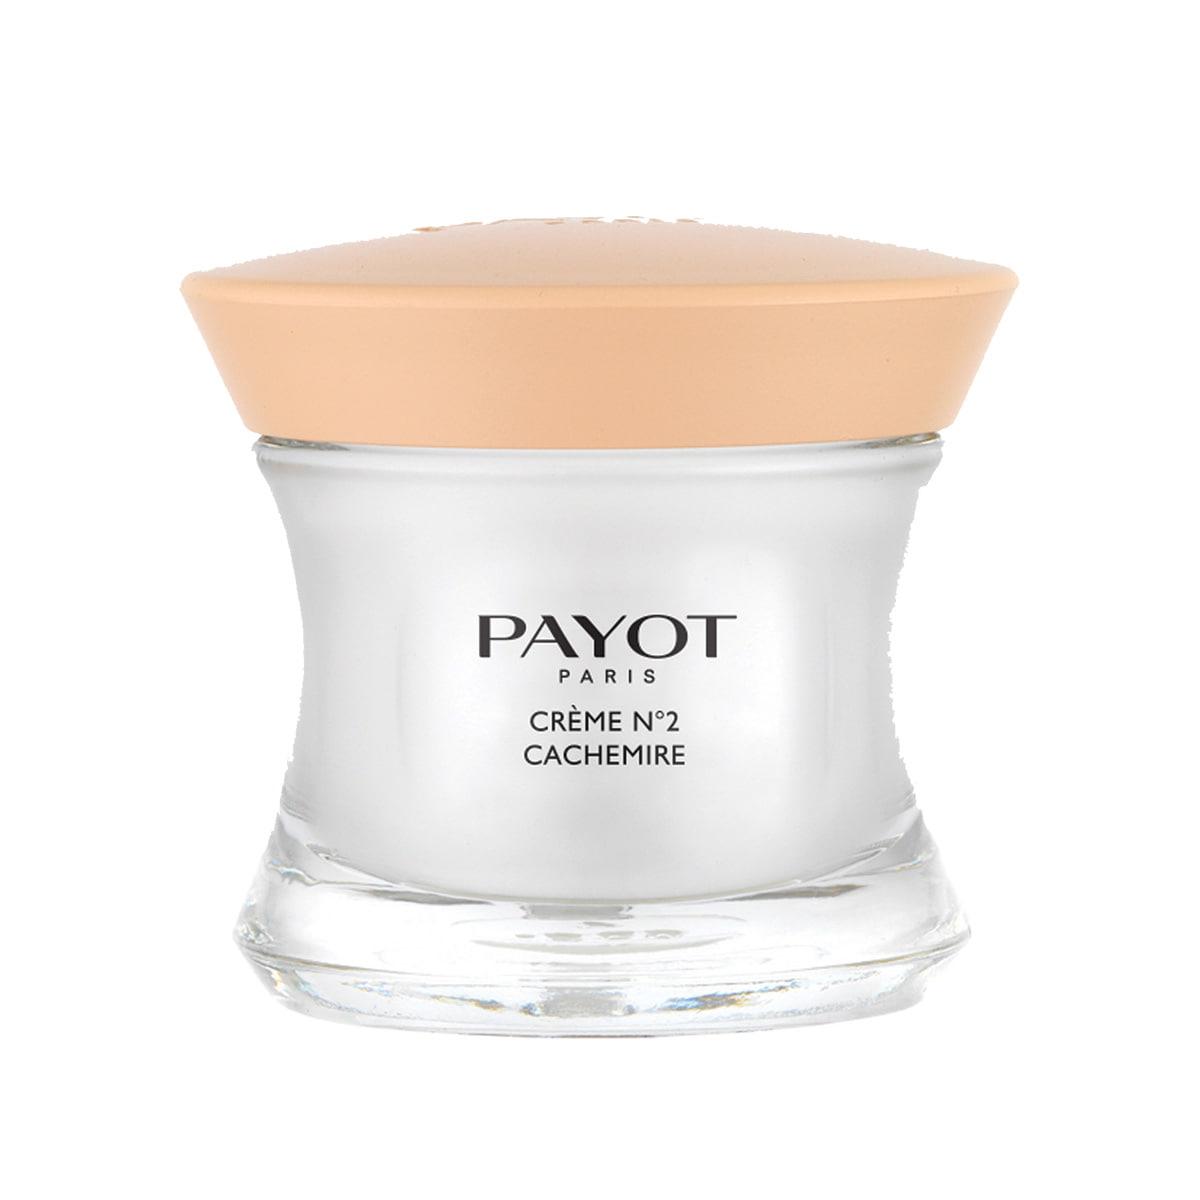 Payot - Crème N°2 Cachemire - Soin riche apaisant anti-stress anti-rougeurs